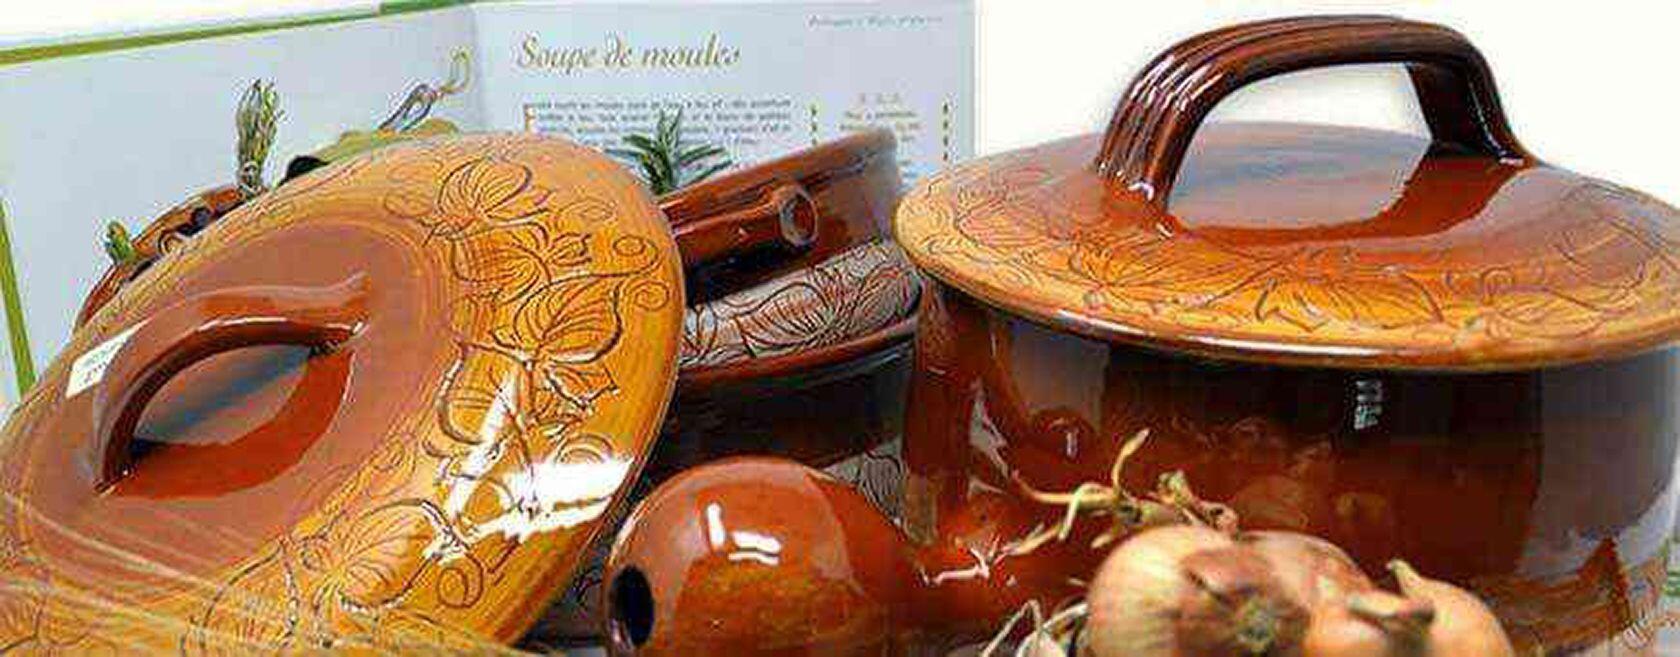 Understanding Provencal Ceramics Pottery poterie-culinaire-de-vallauris